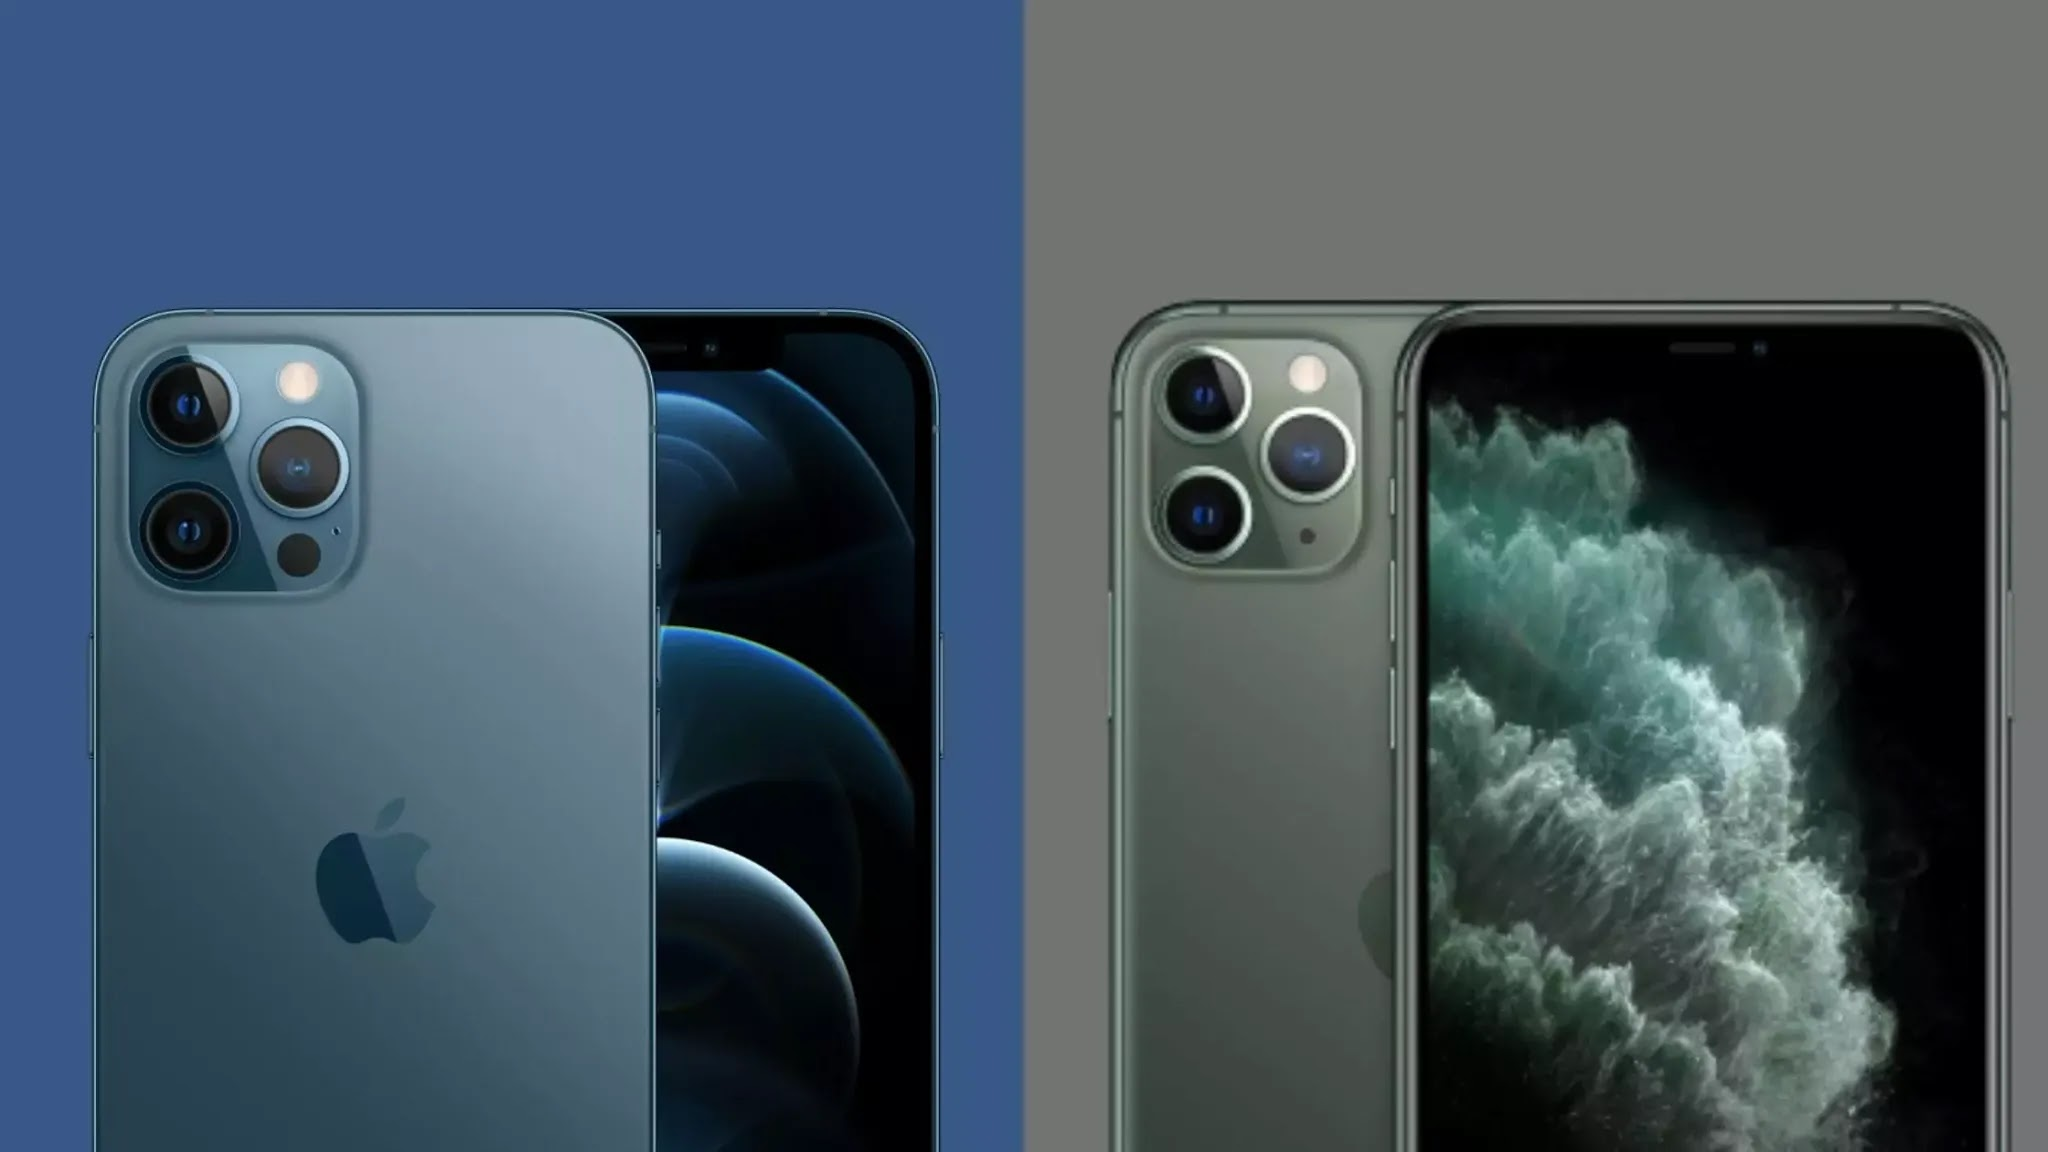 comparing-specs-iphone-12-pro-max-iphone-11-pro-max-price-unboxing, price-of-iphone-12-pro-max,